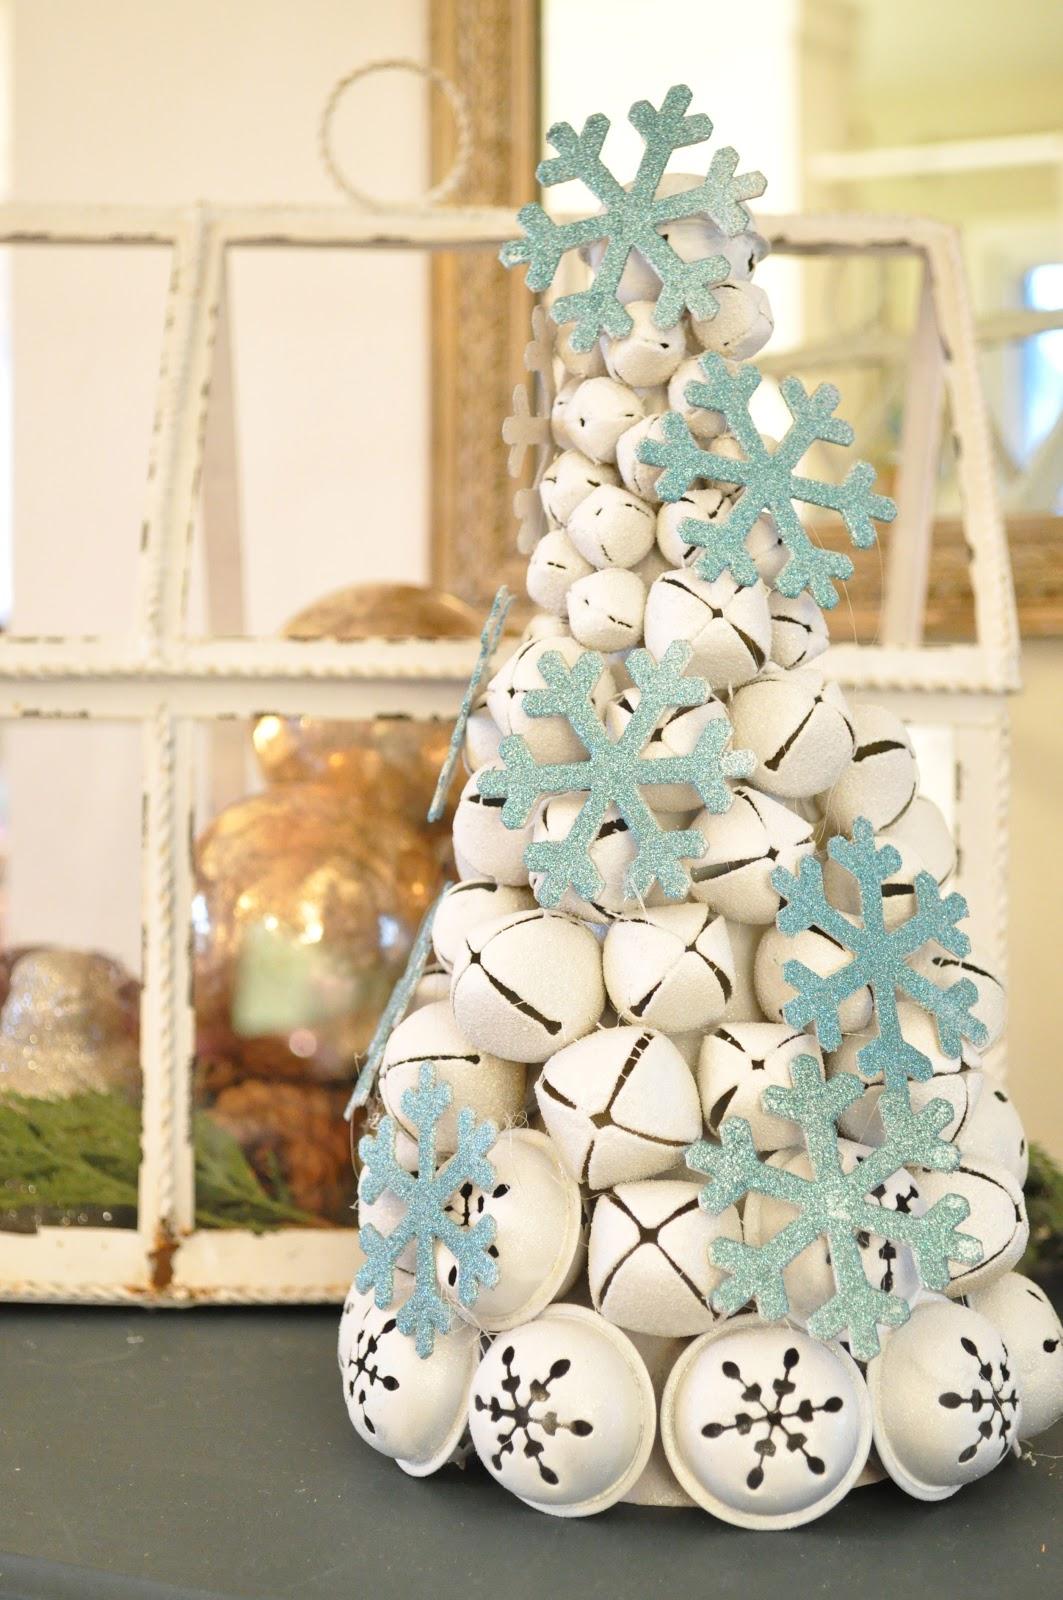 Make a jingle bell tree jennifer rizzo for Unusual christmas trees